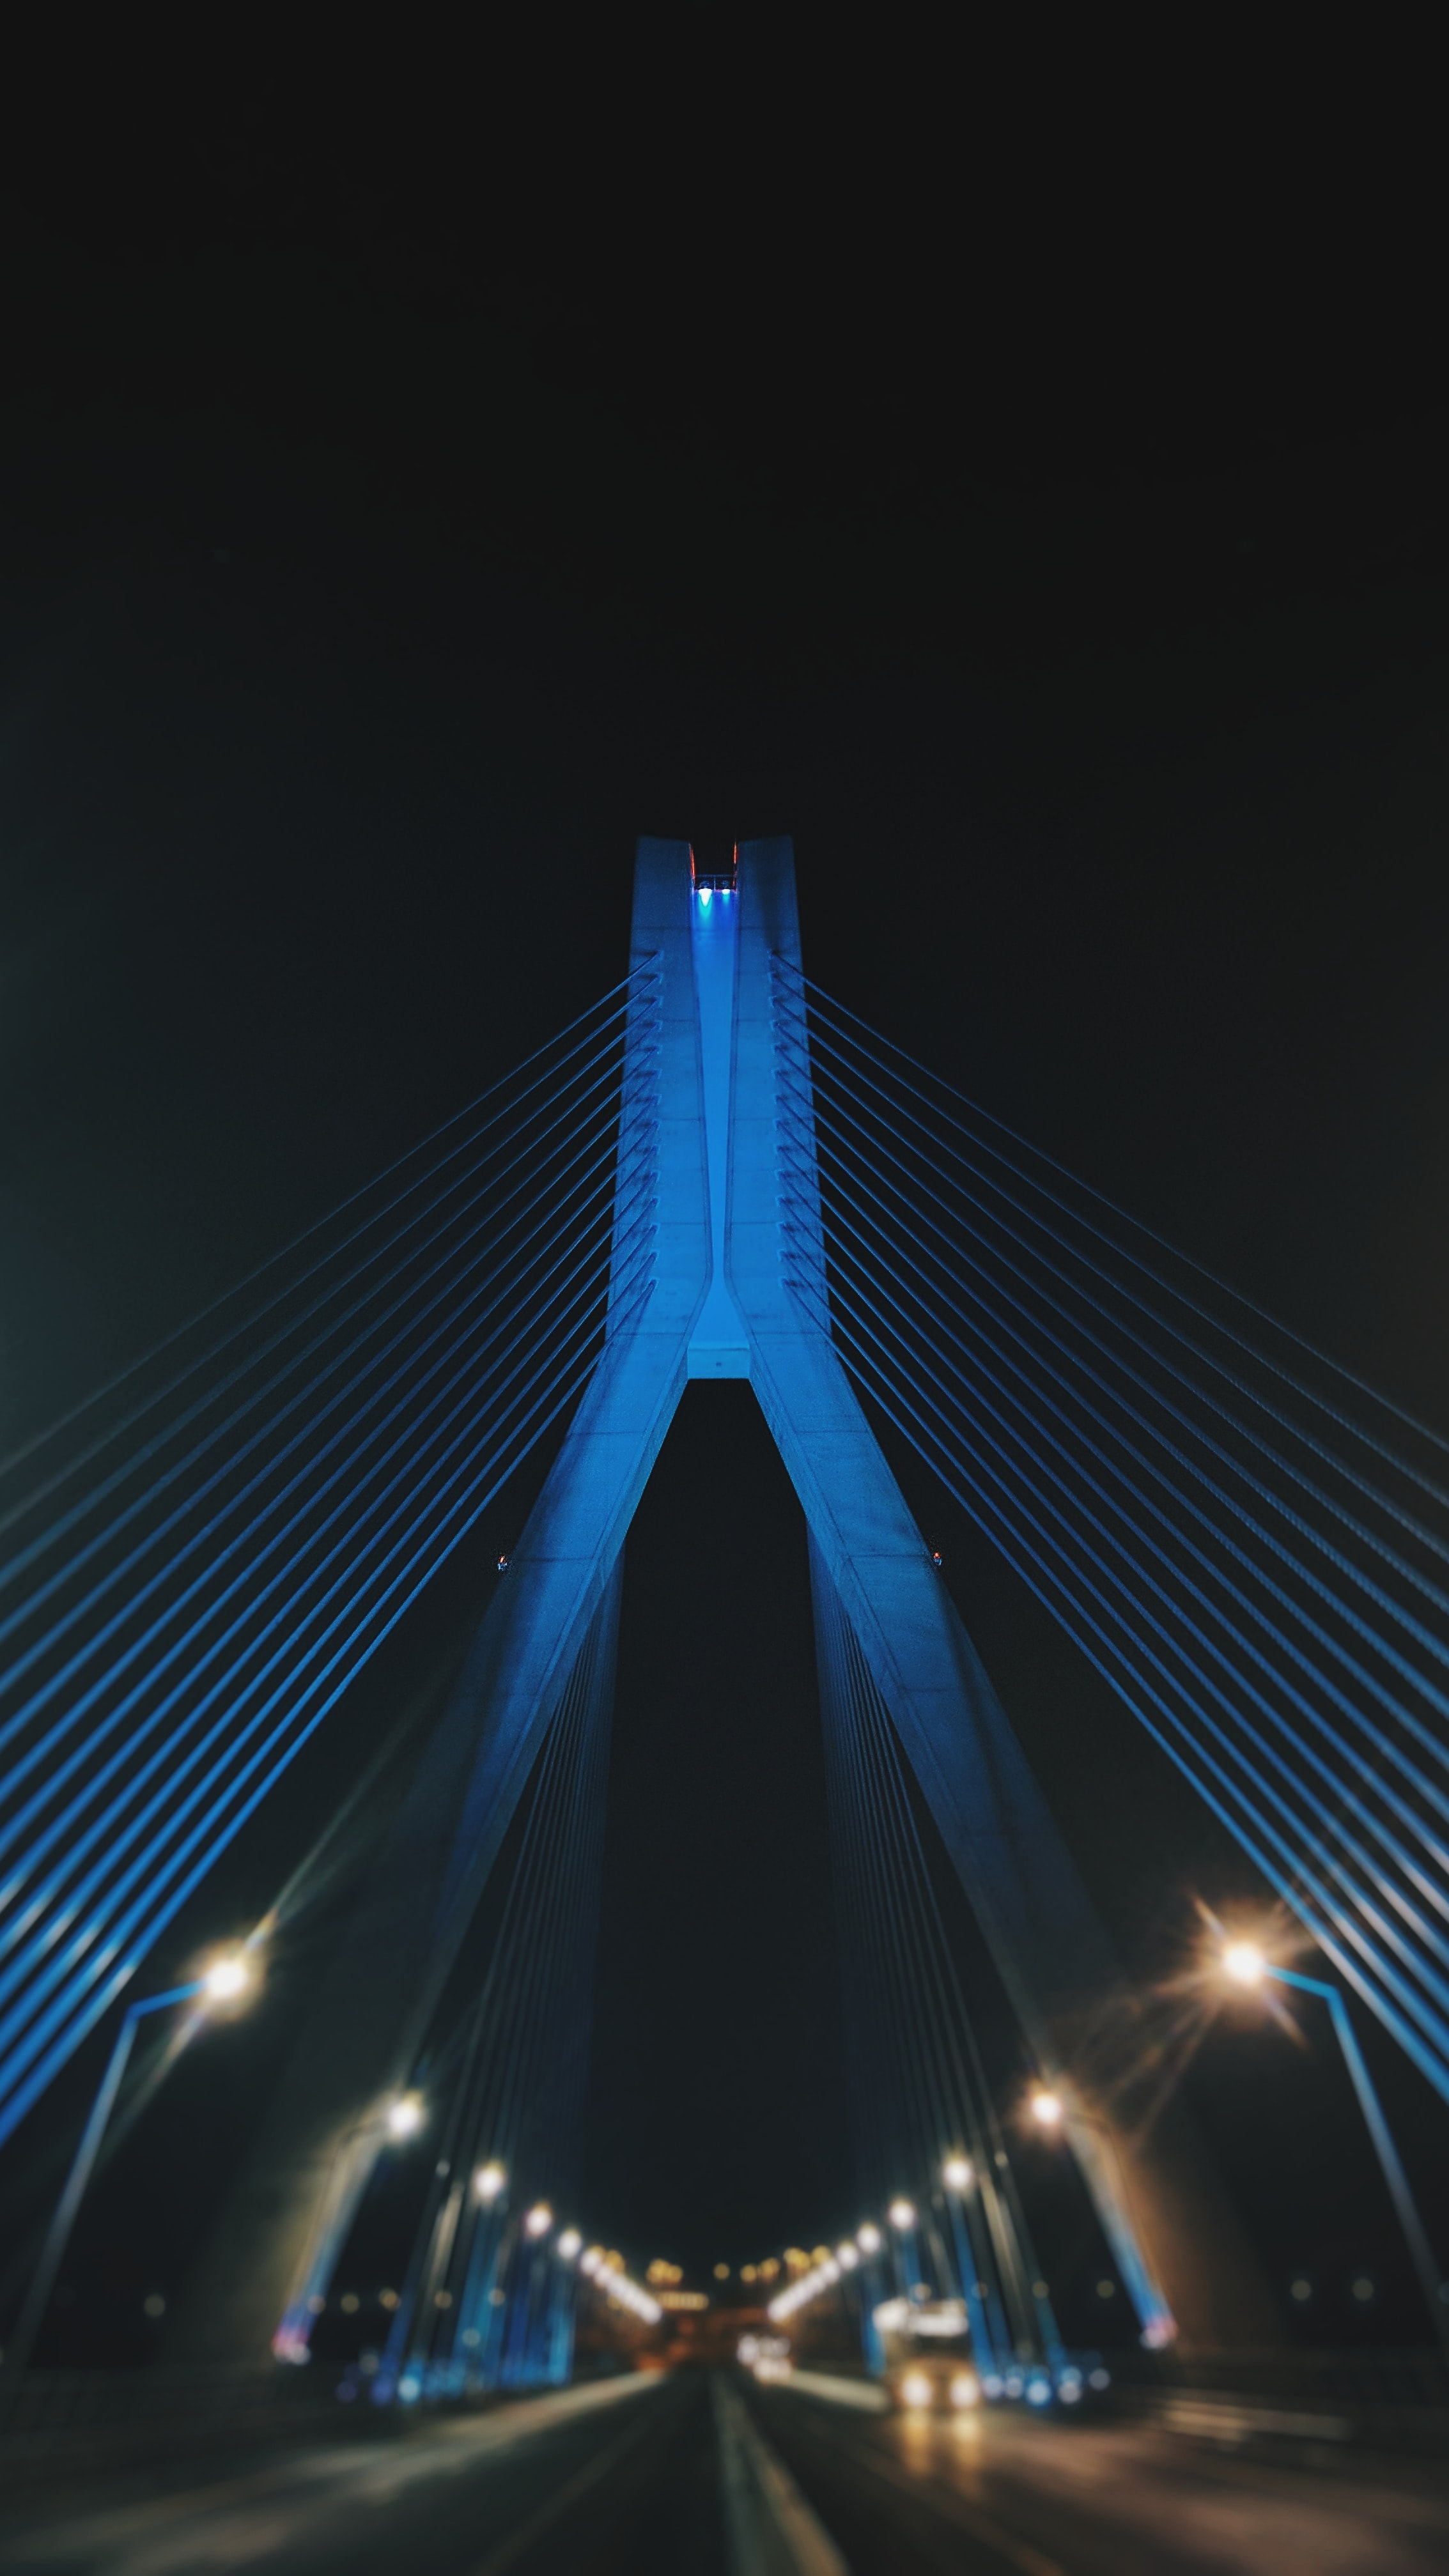 A blue illuminated bridge at night across a street full of lanterns